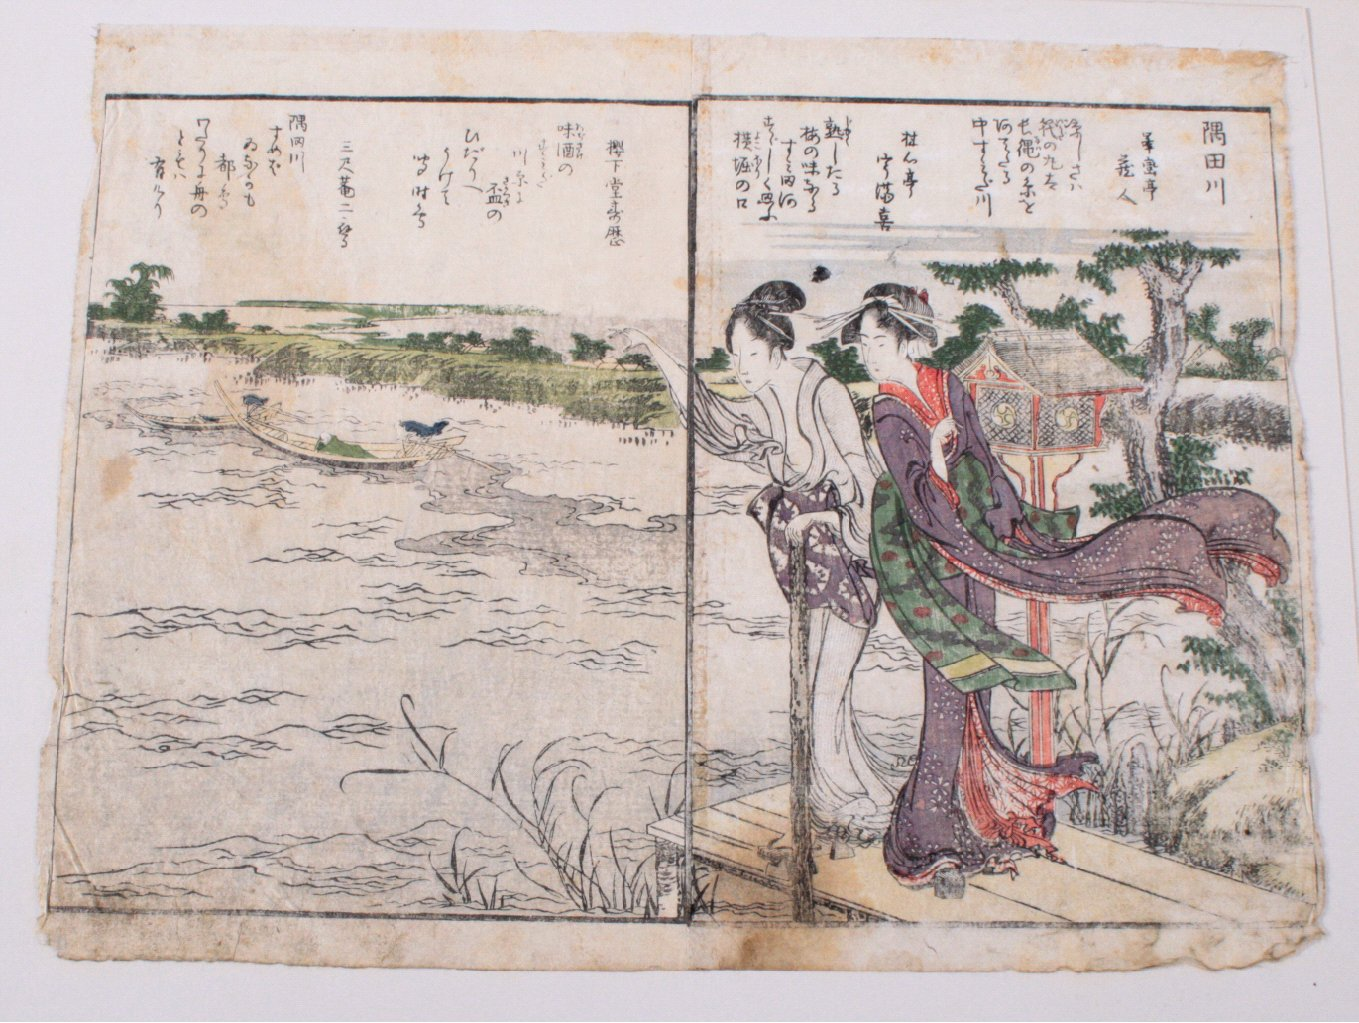 Japan um 1900 ?, Farbholzschnitt